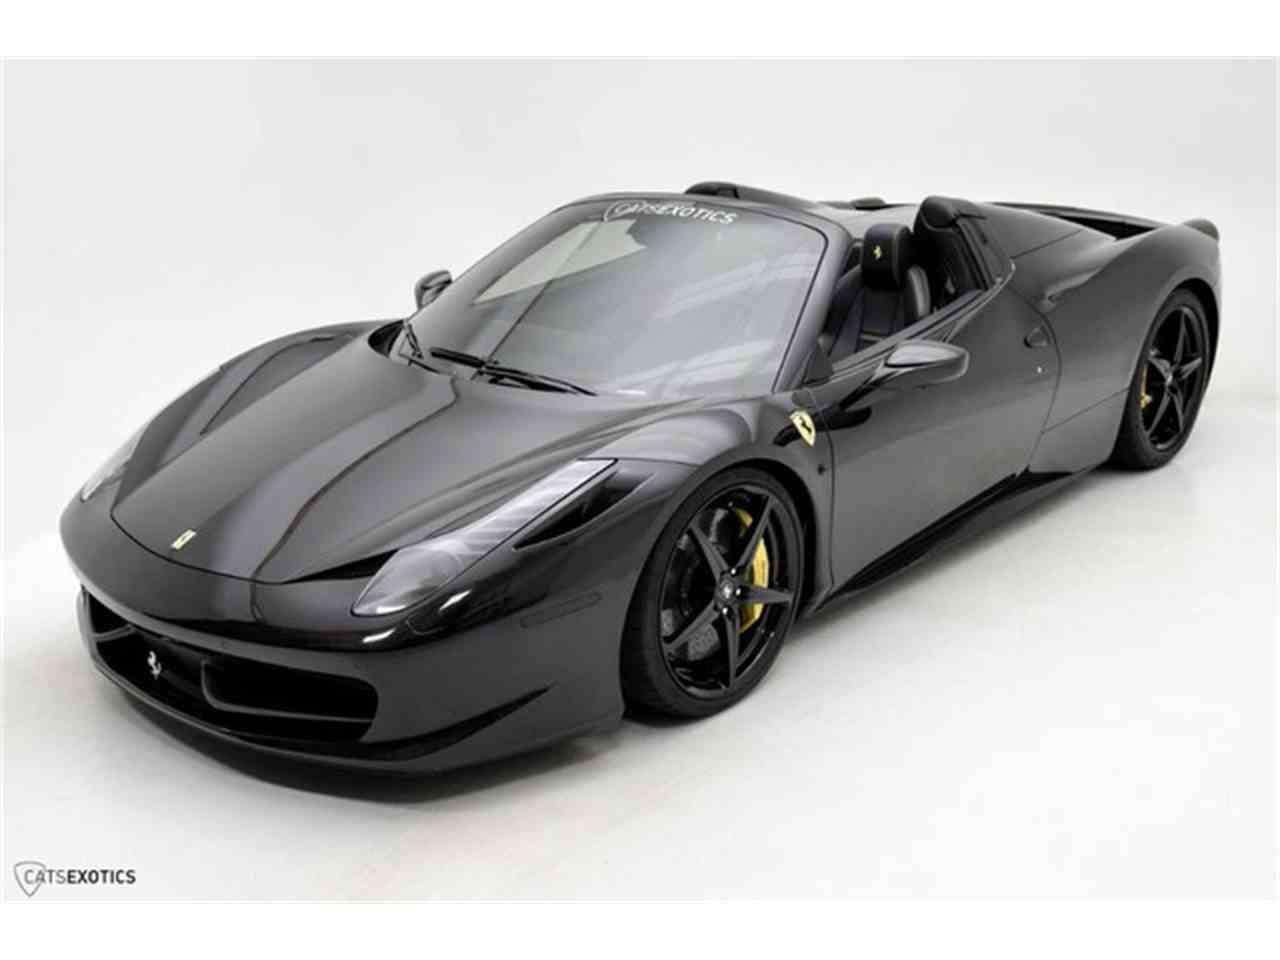 already news via car hits laferrari l sale for seattle ferrari used up the in semco image market